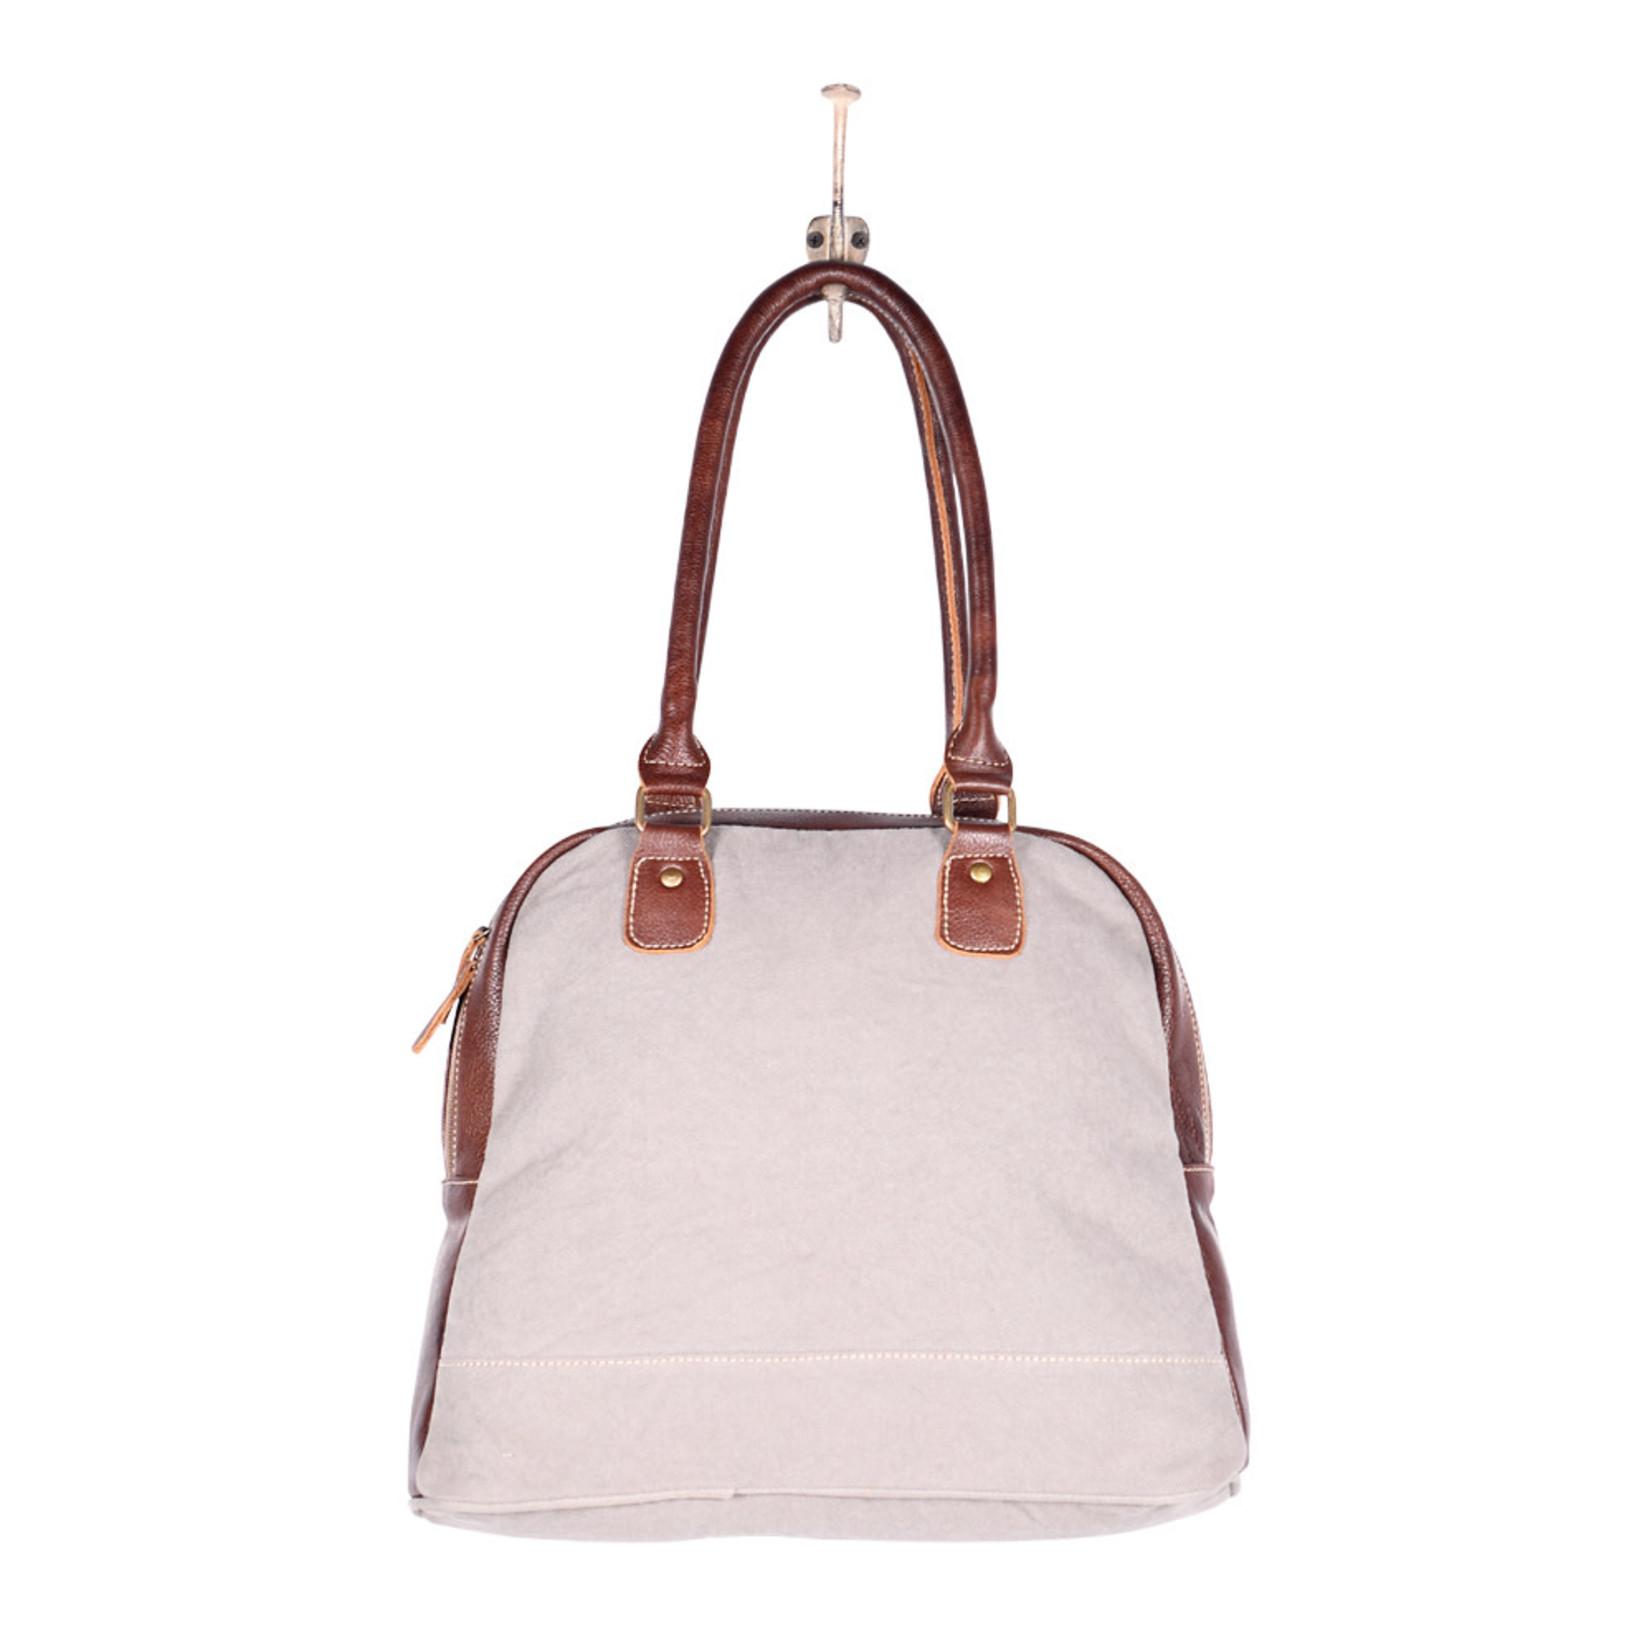 Myra Bags S-1883 Craggy Small Bag